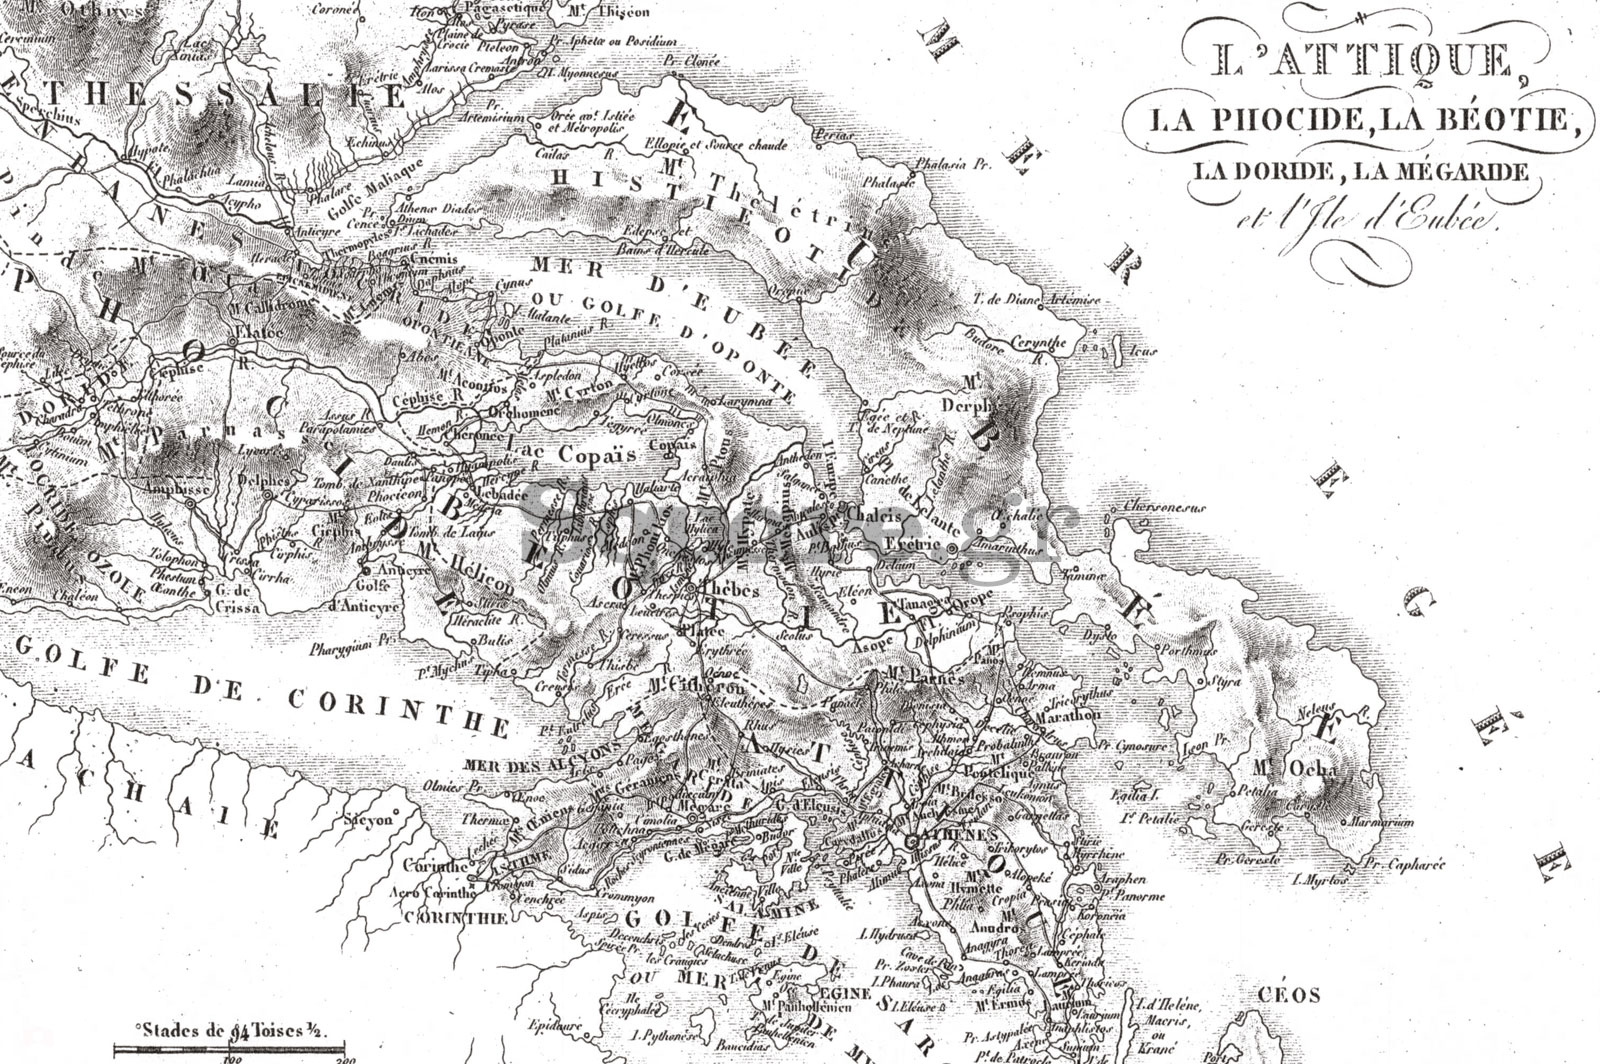 13-Abbe-J-J-Barthelemy-Voyage-du-jenne-Anacharsis-1821